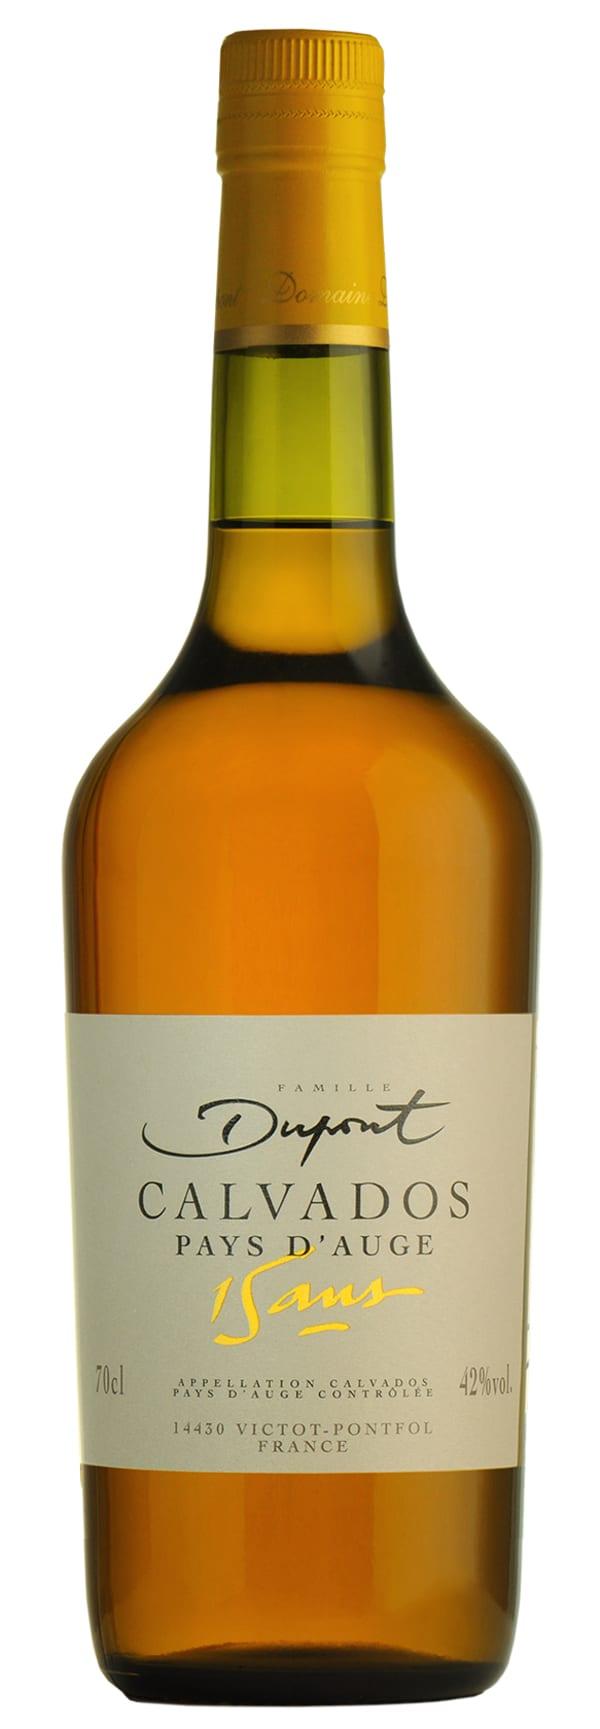 Dupont 15 Ans Calvados